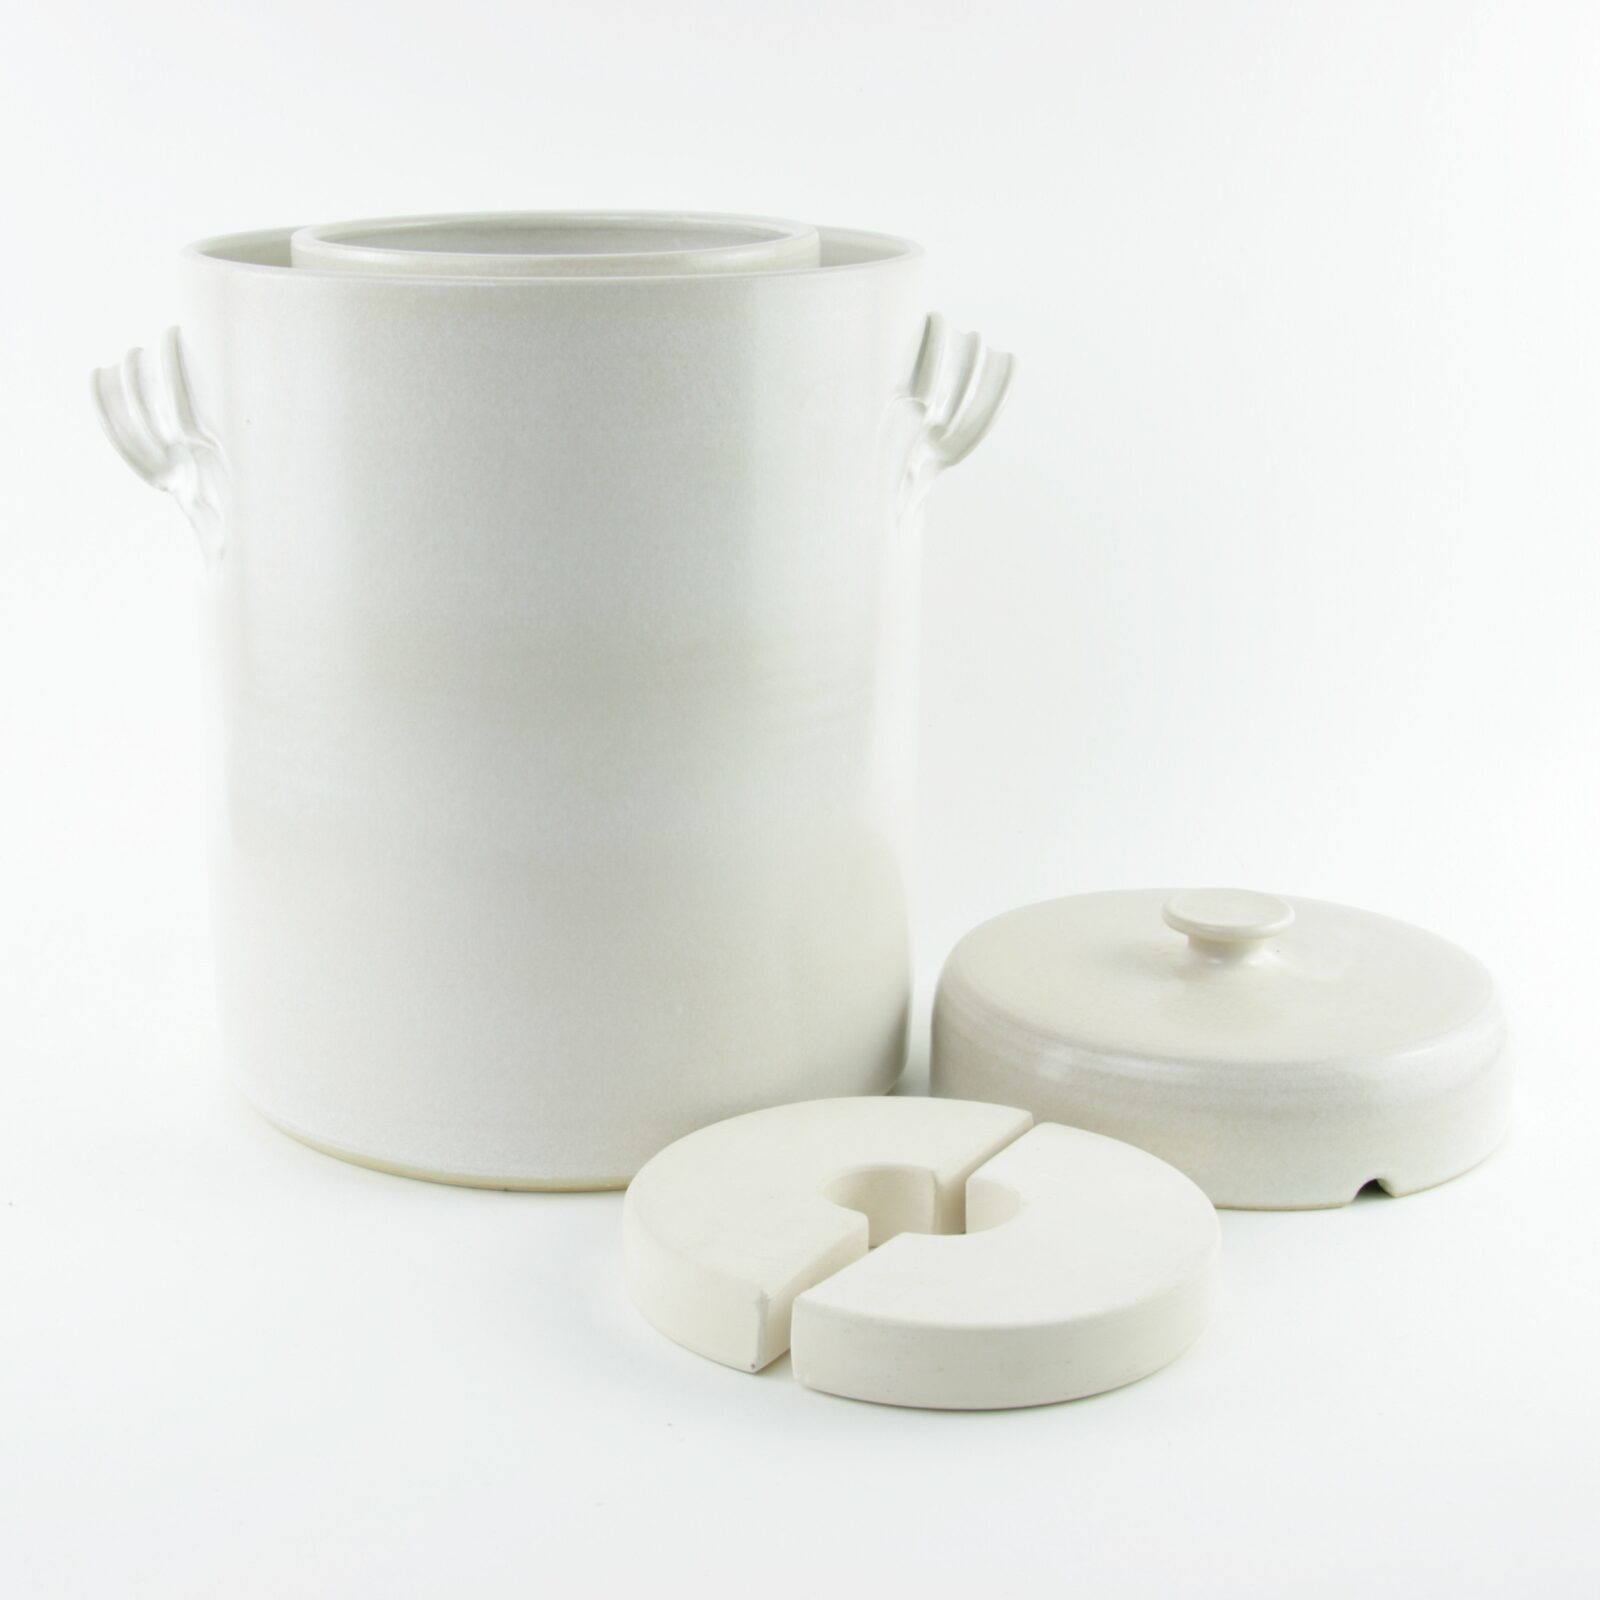 4 litre handmade ceramic sauerkraut crock in white with weight stones